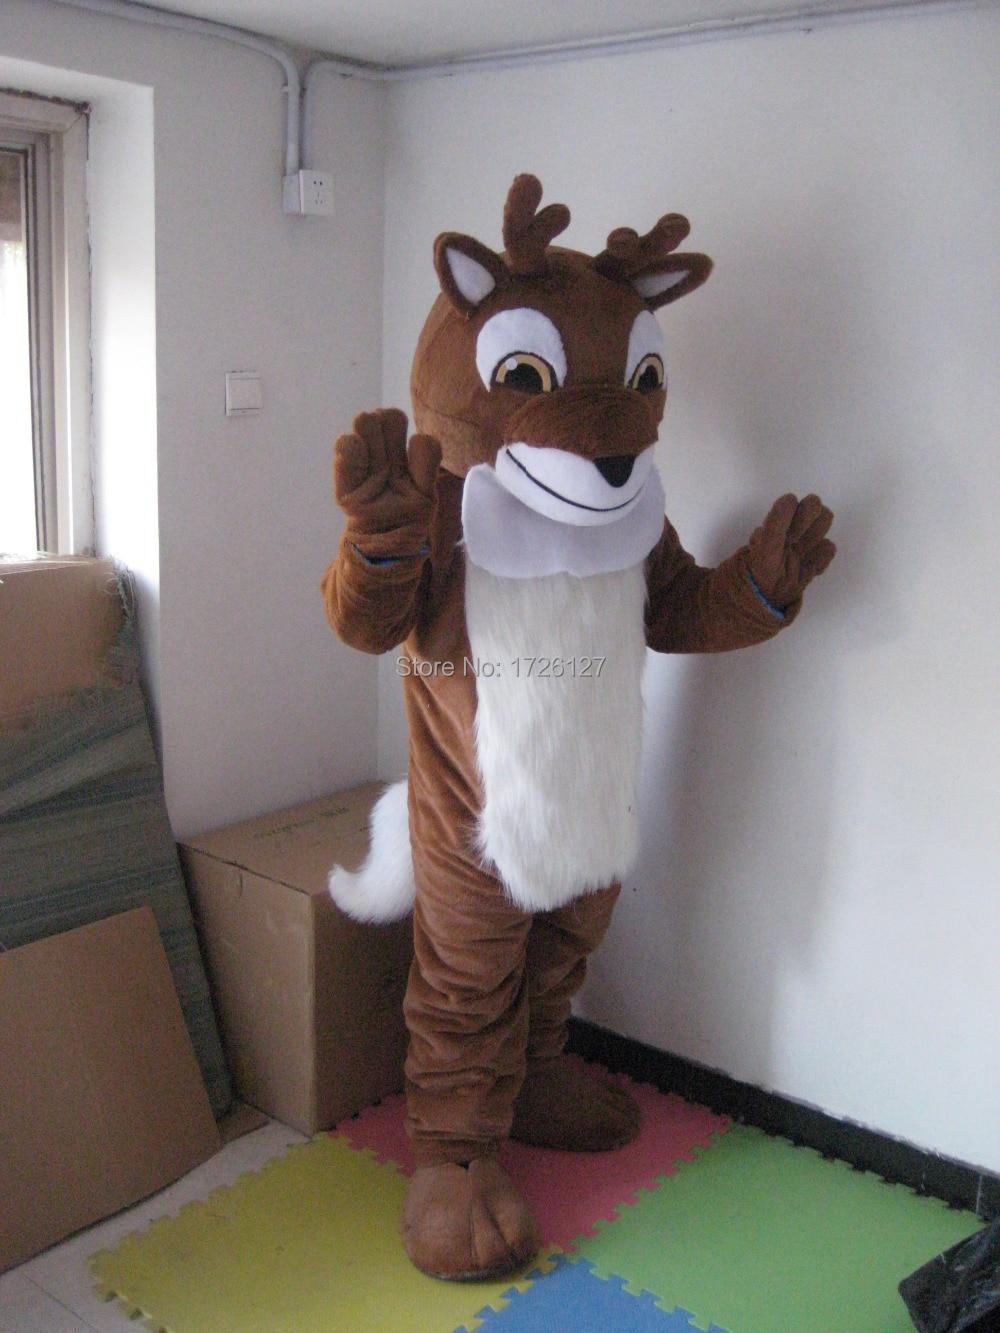 mascot Reindeer Moose Deer Mascot costume custom fancy costume anime cosplay kits mascotte fancy dress carnival costume